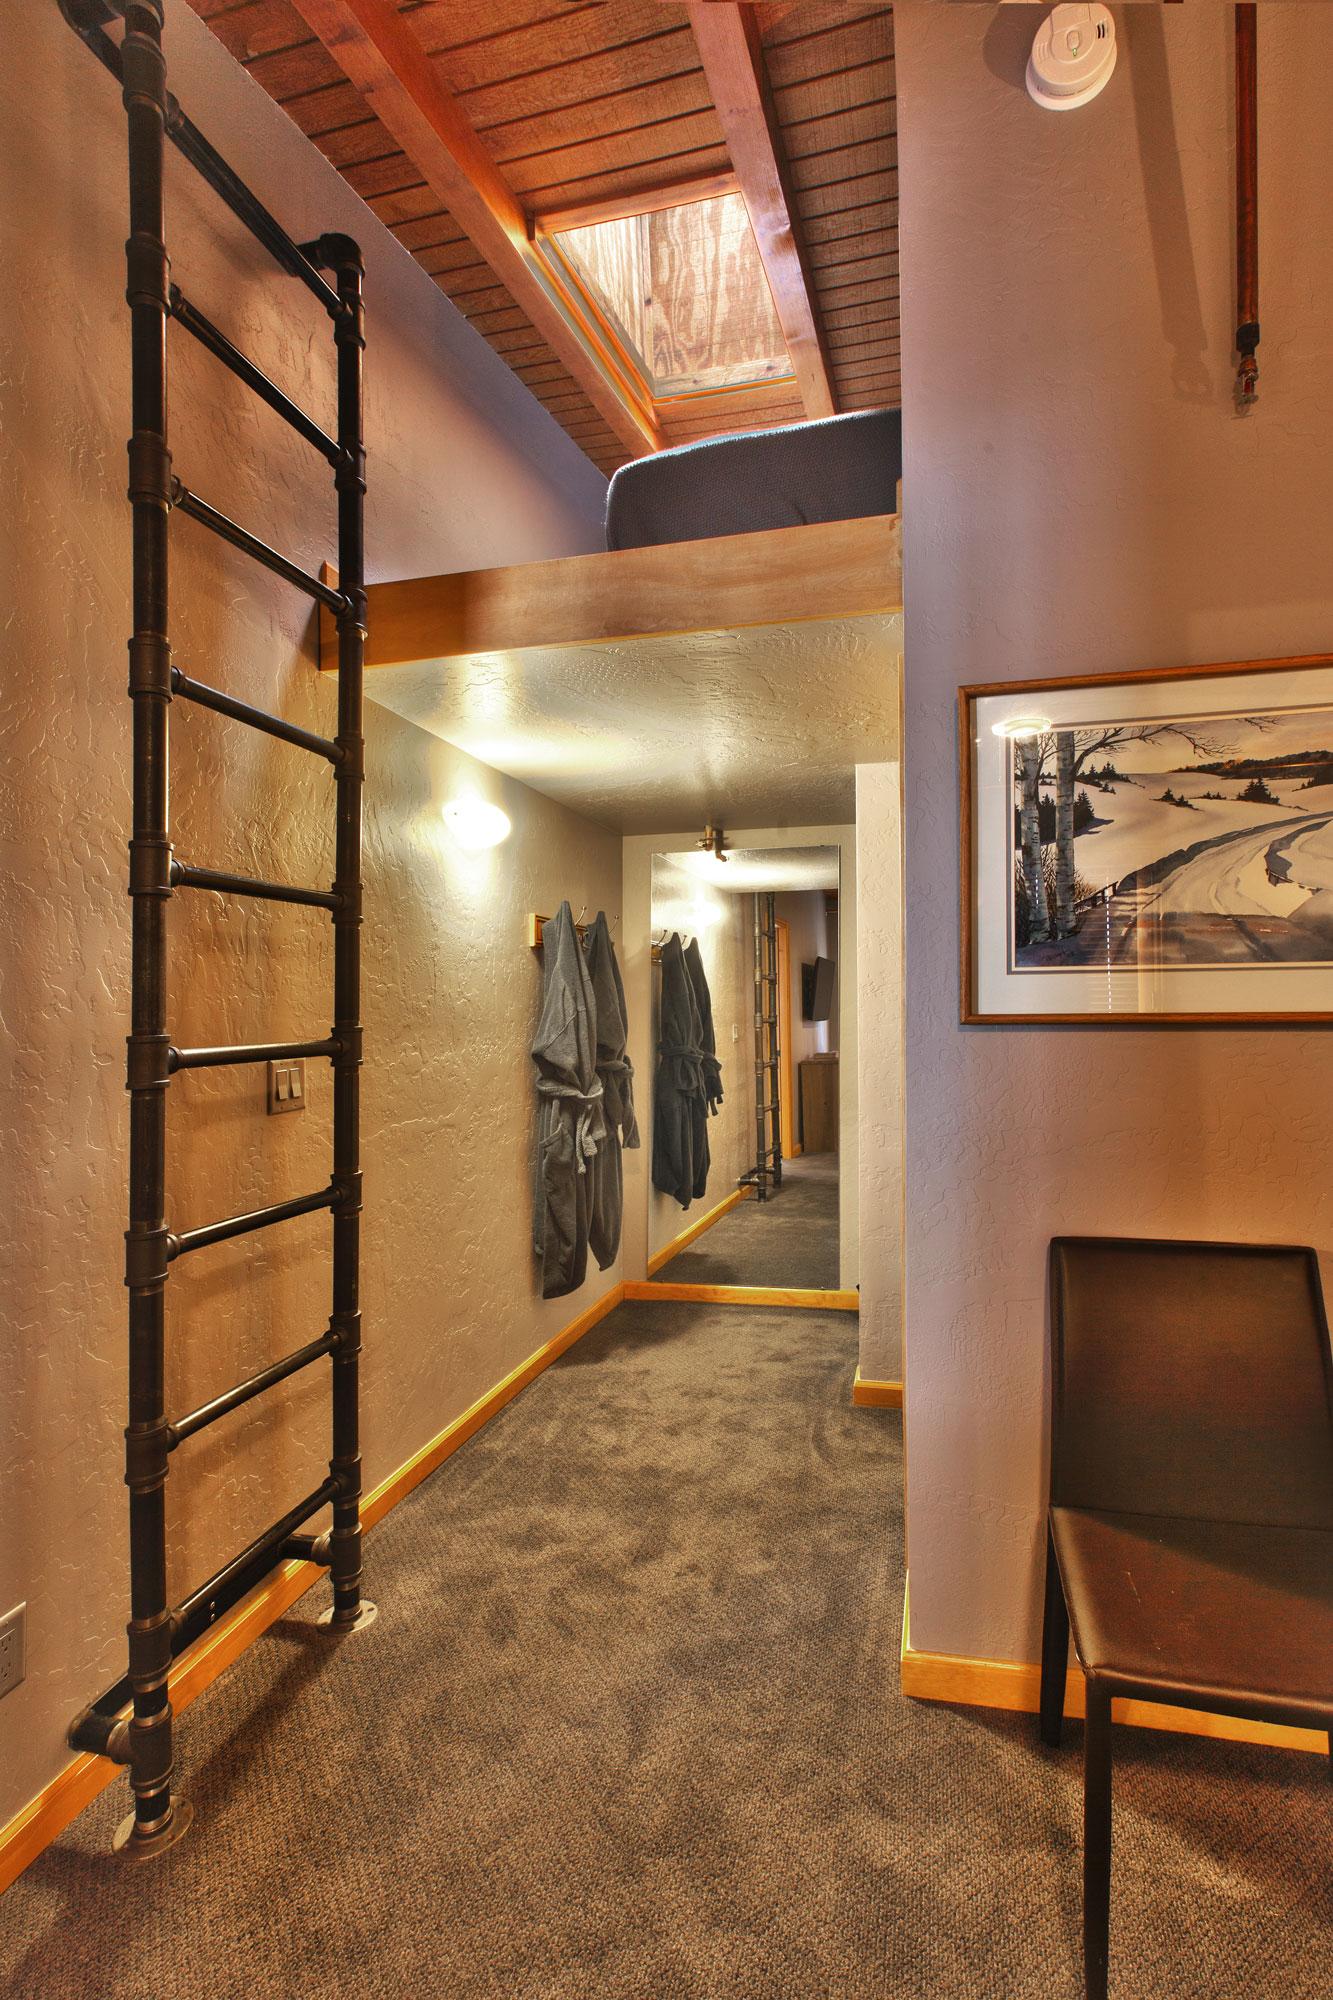 Unit 2 2 bedroom 2 bath heretic condos for 2 bedroom lofts